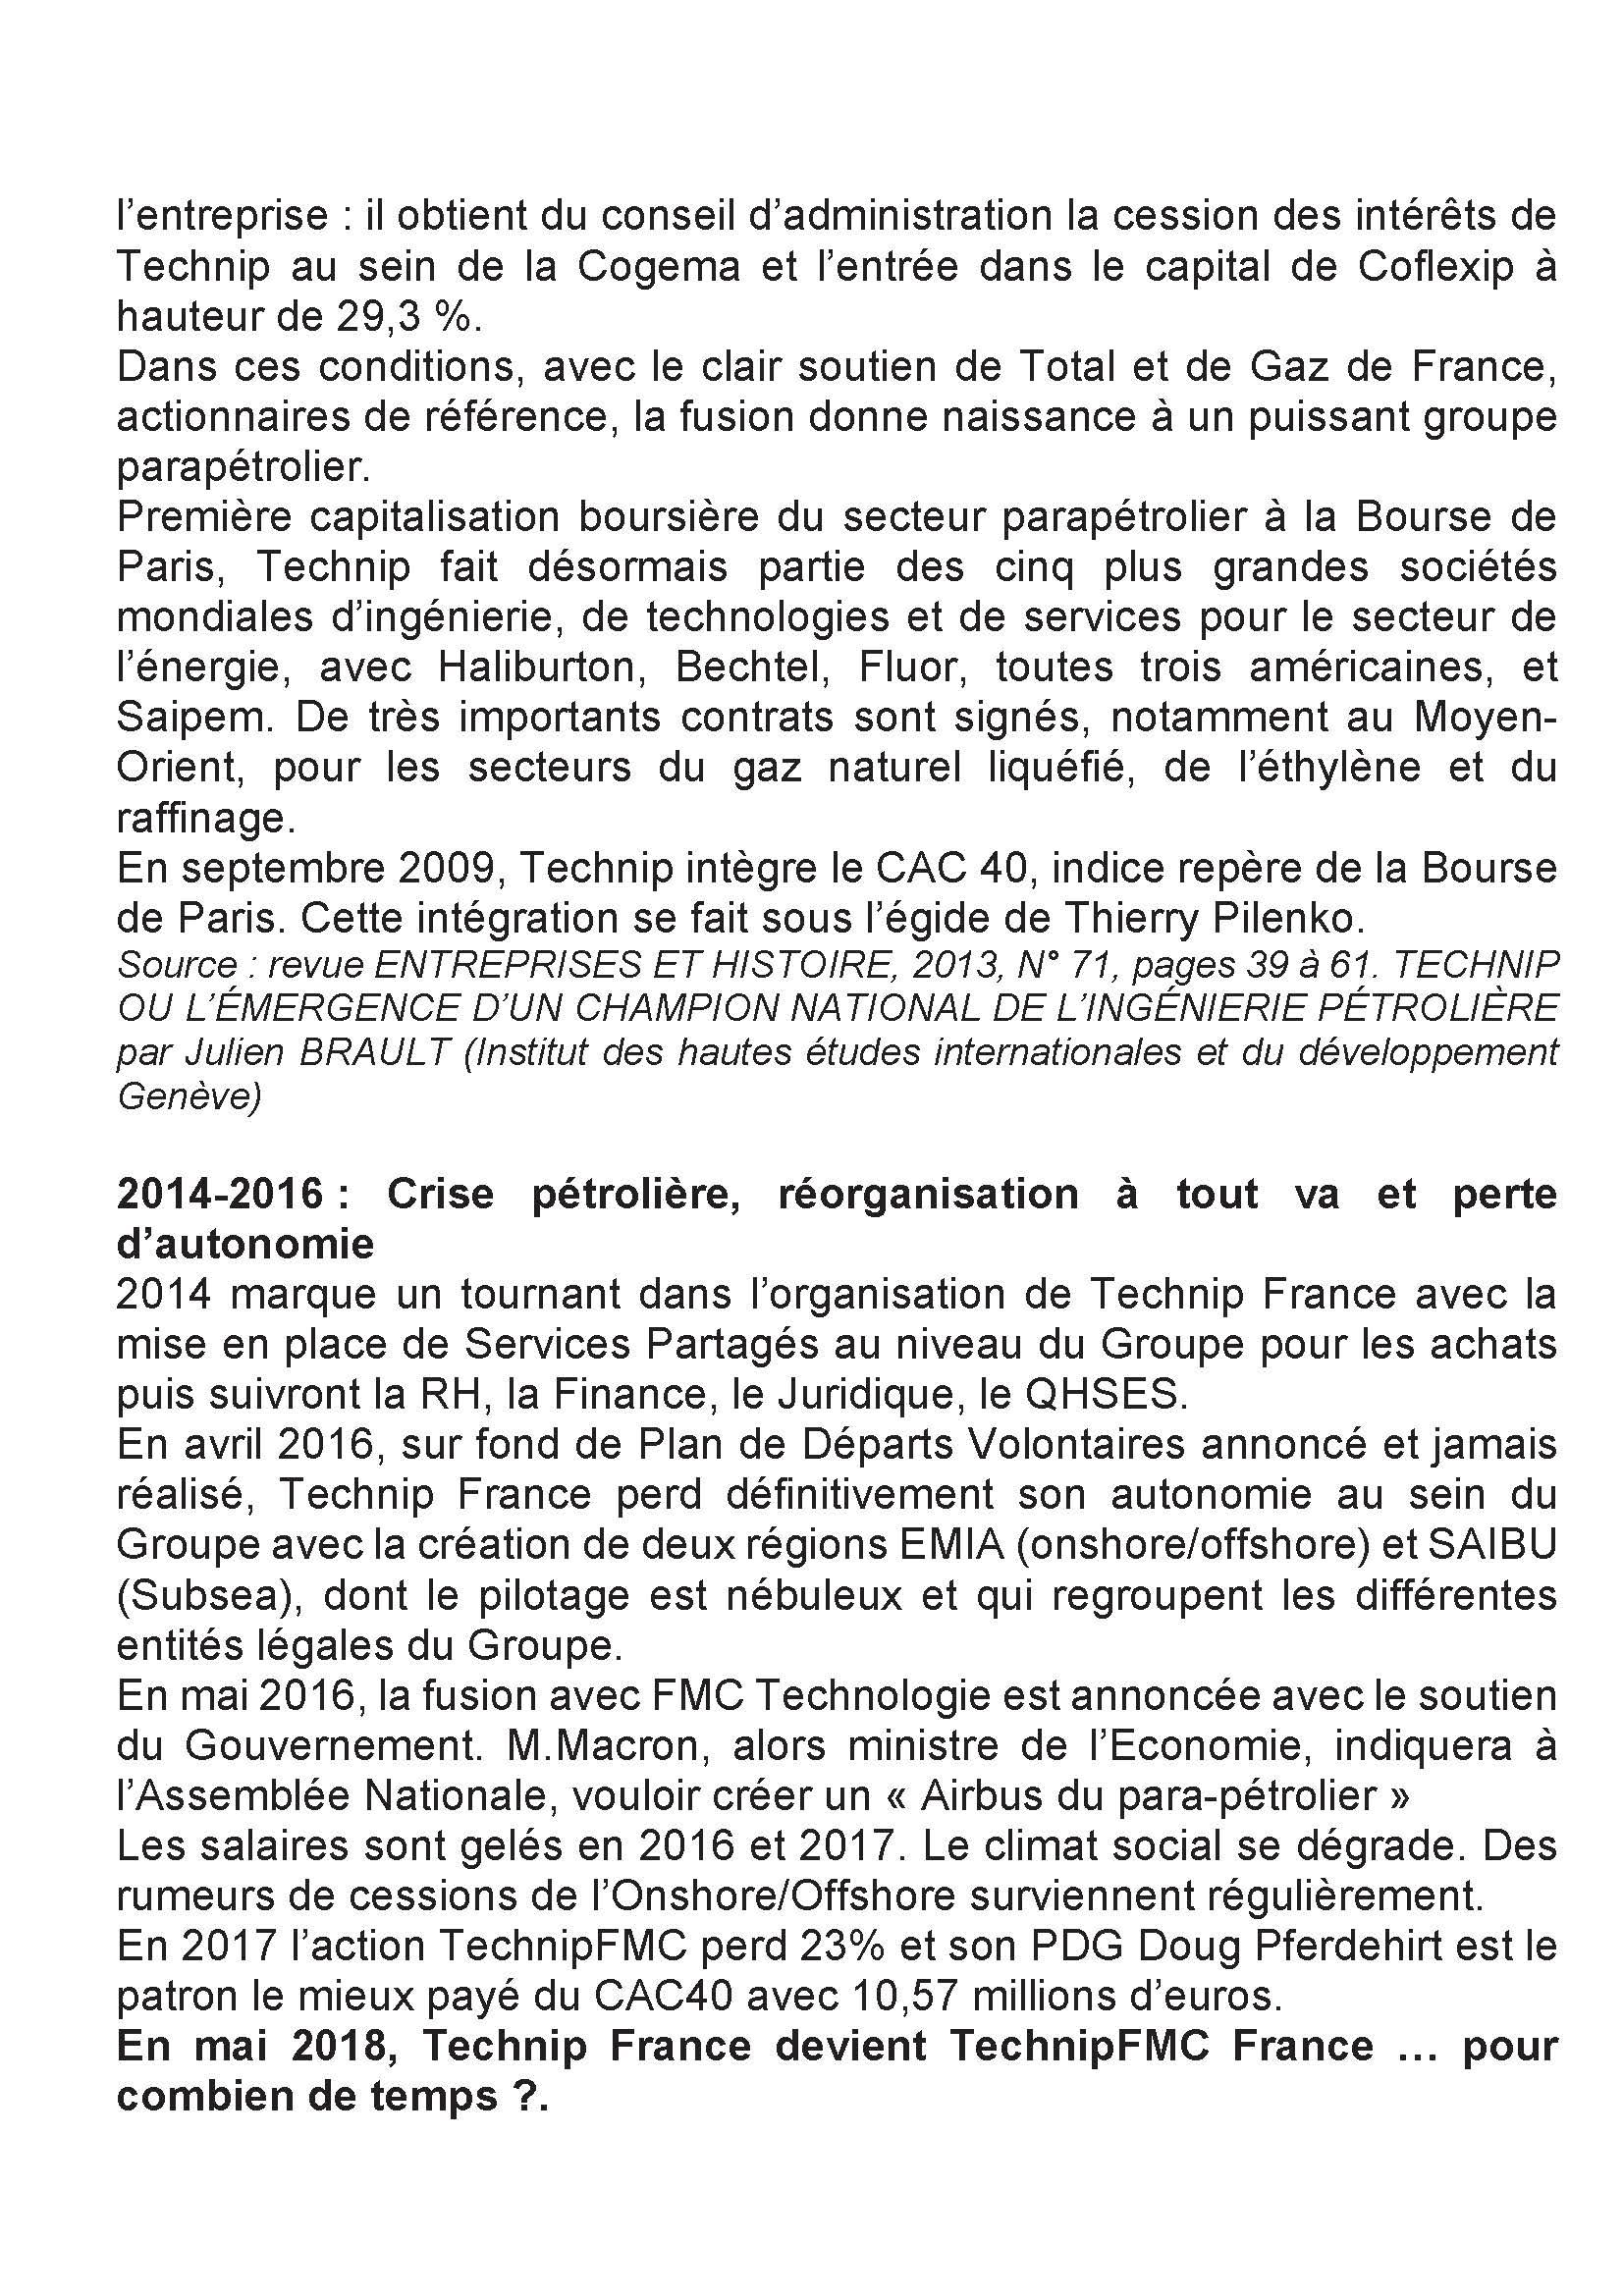 (2018-05-25) - TECHNIP FRANCE A 60 ANS ! BON ANNIVERSAIRE Tract_41